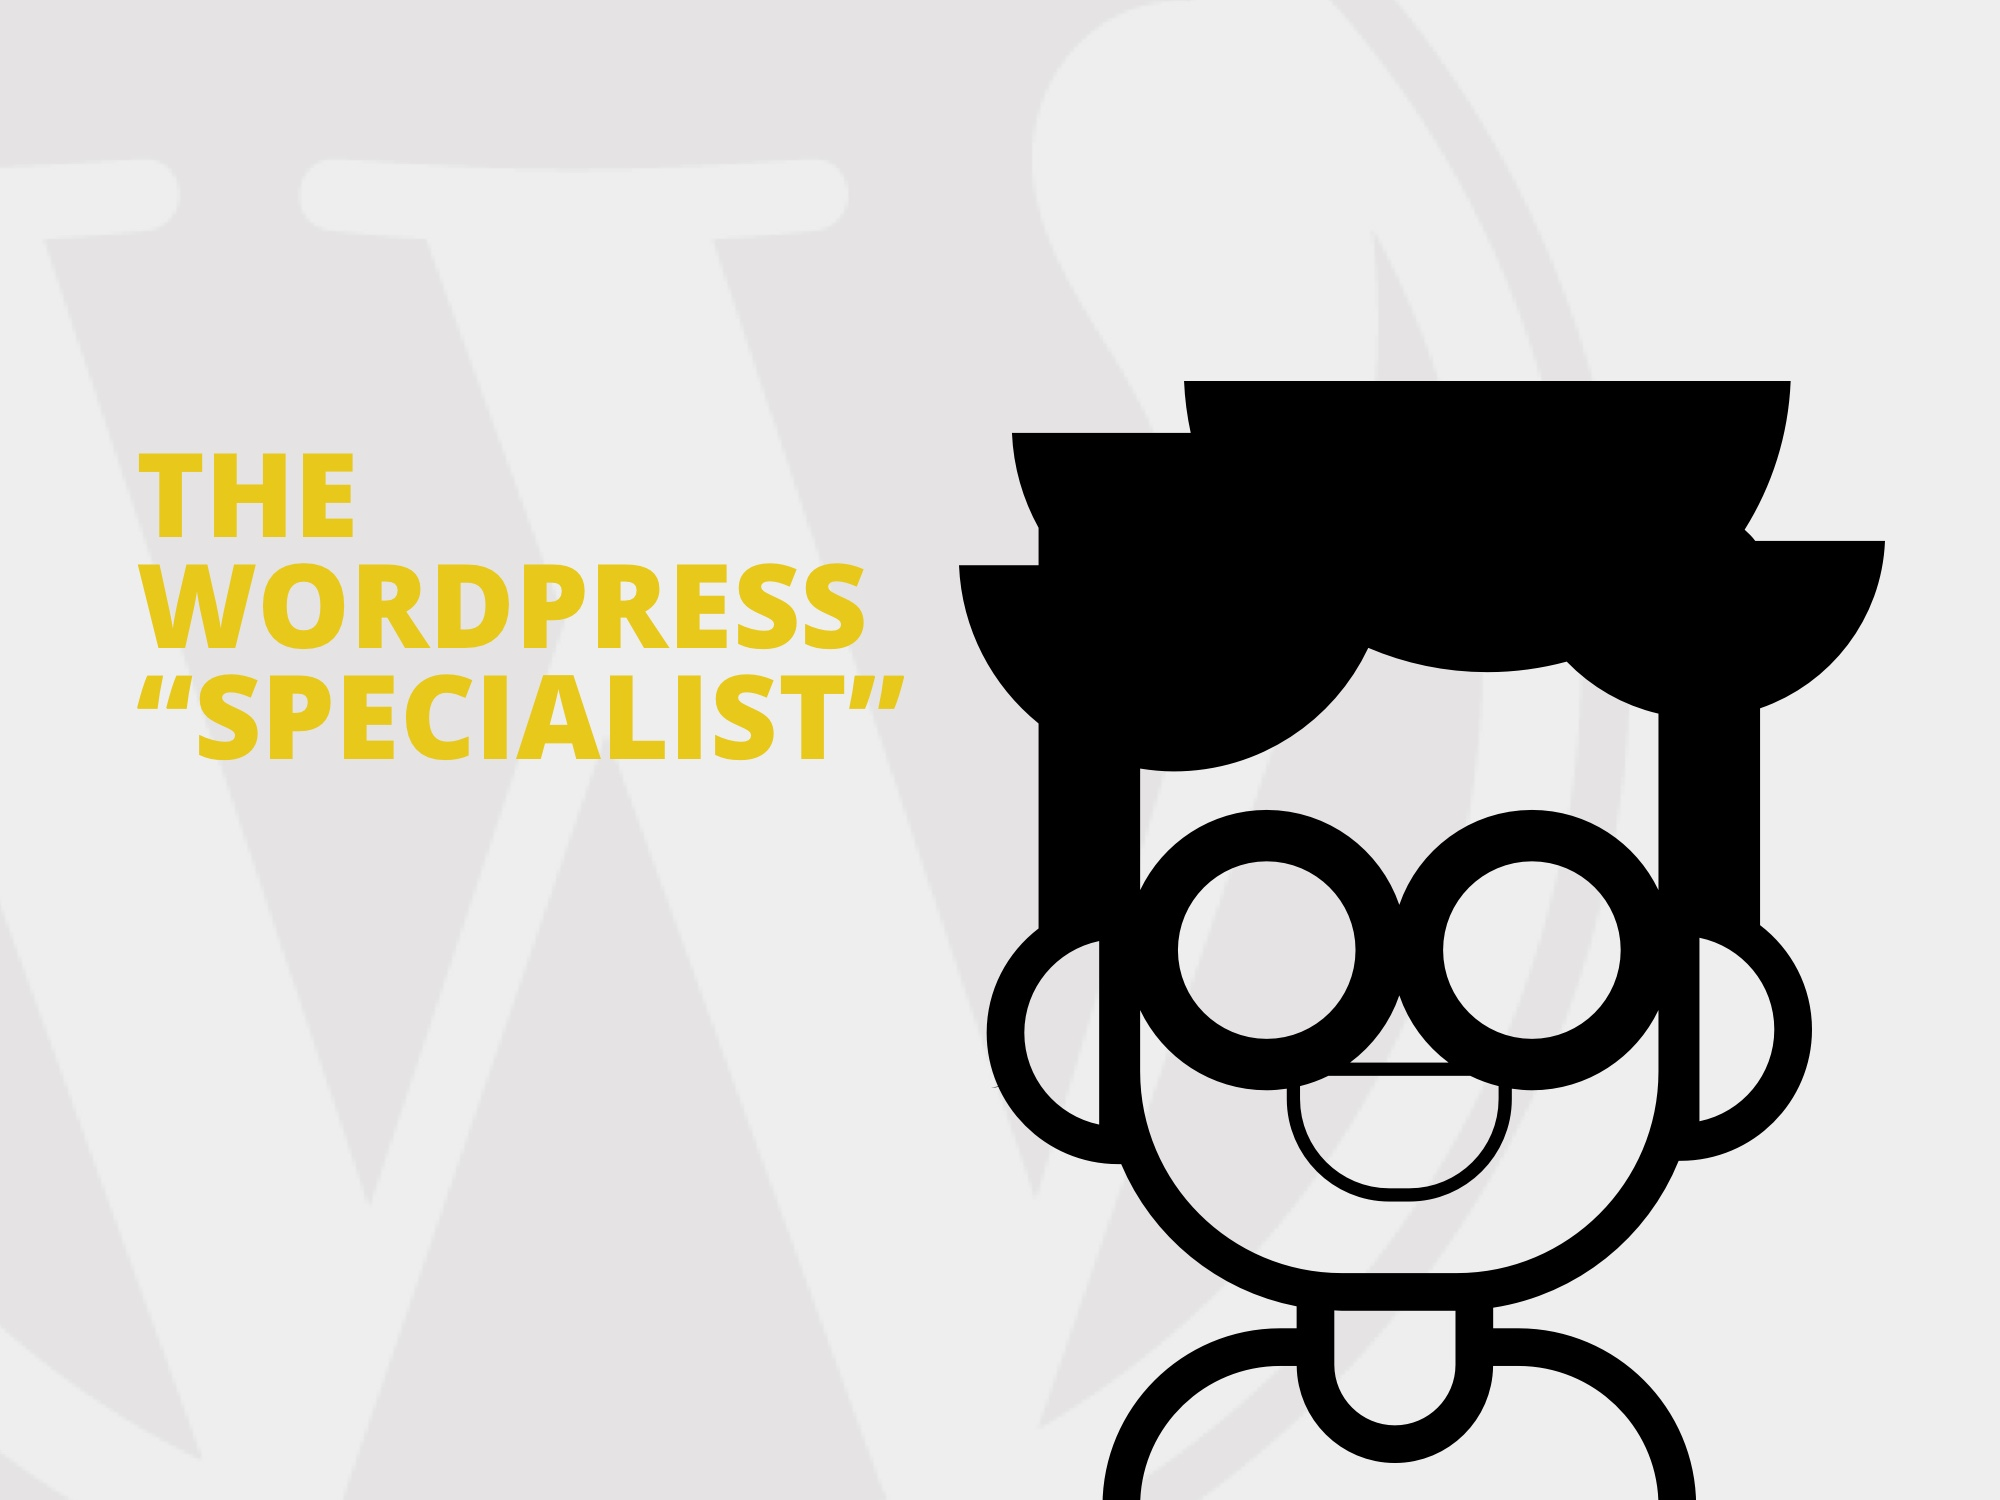 The Wordpress Specialist